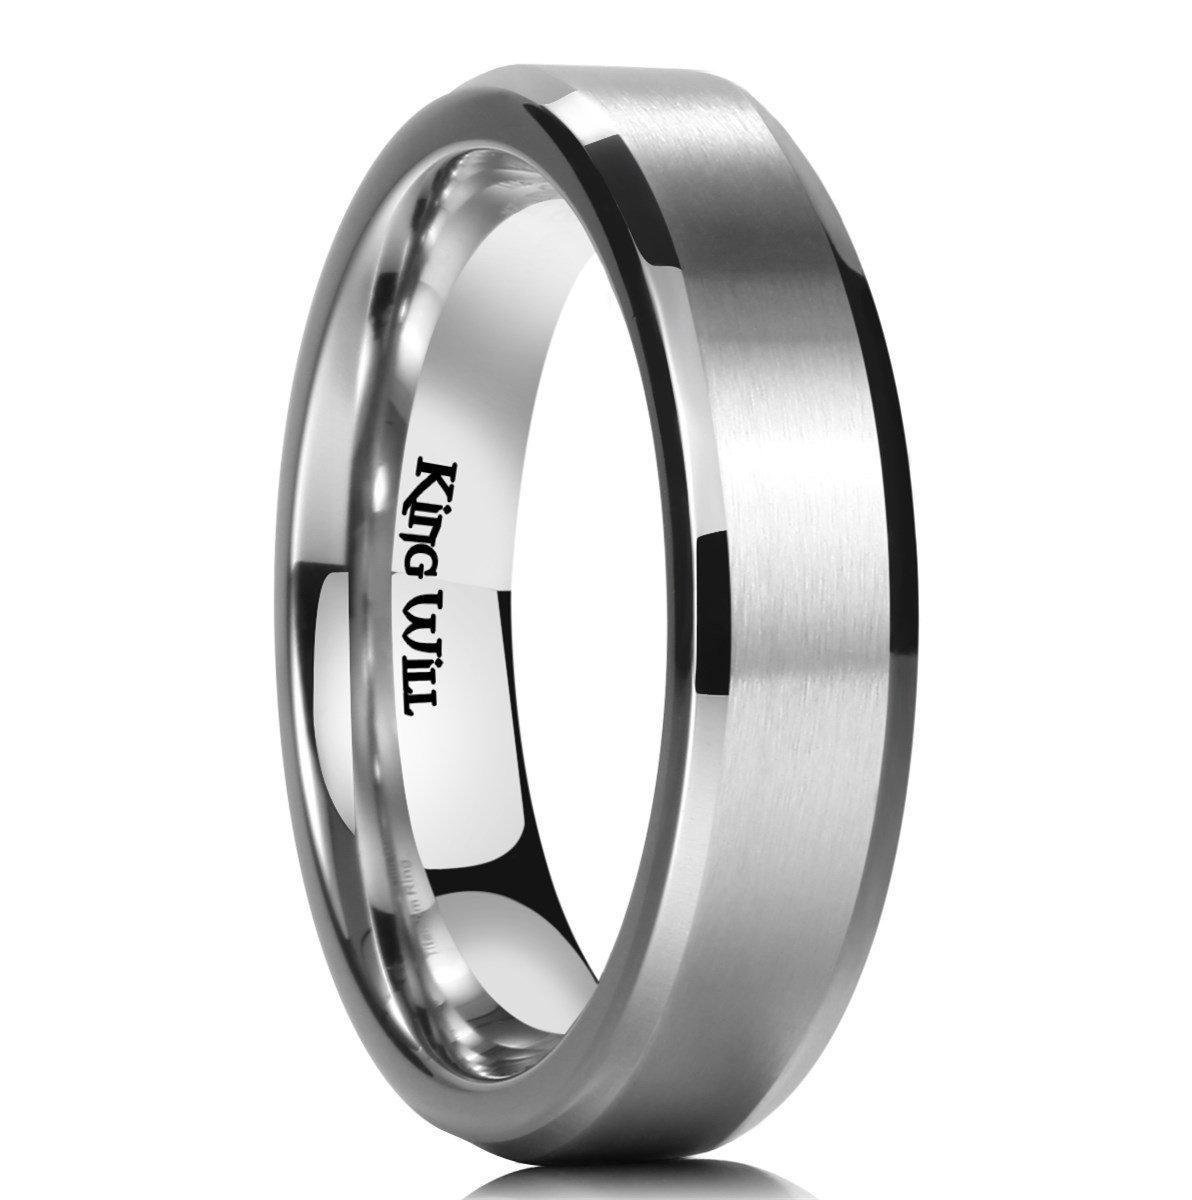 King Will BASIC 5mm Titanium Ring Brushed Matte Comfort Fit Flat Stainless Steel Wedding Band For Men Women9.5